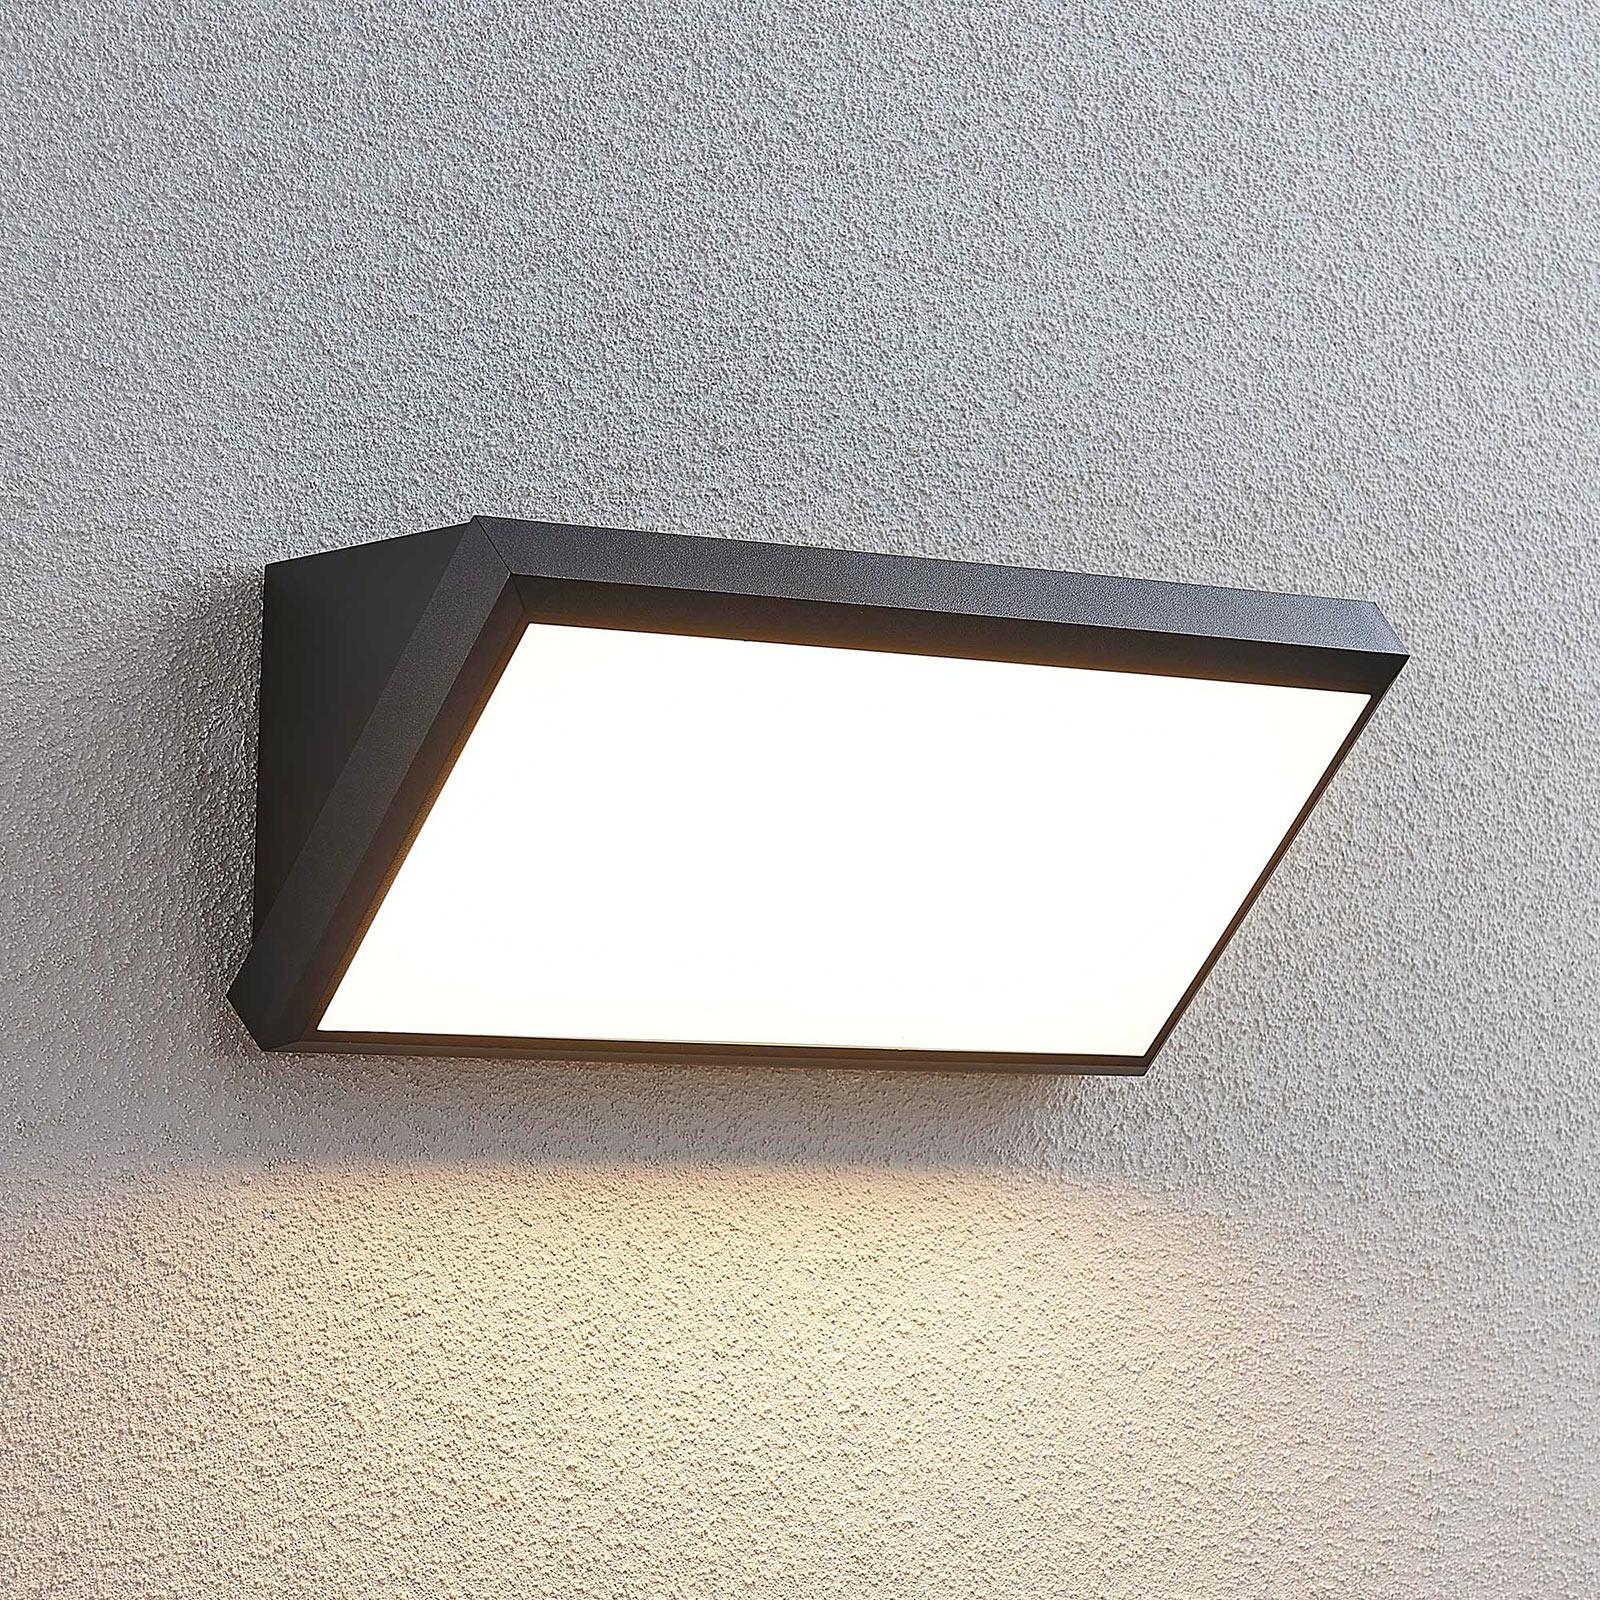 LED-Außenwandleuchte Abby mit Sensor